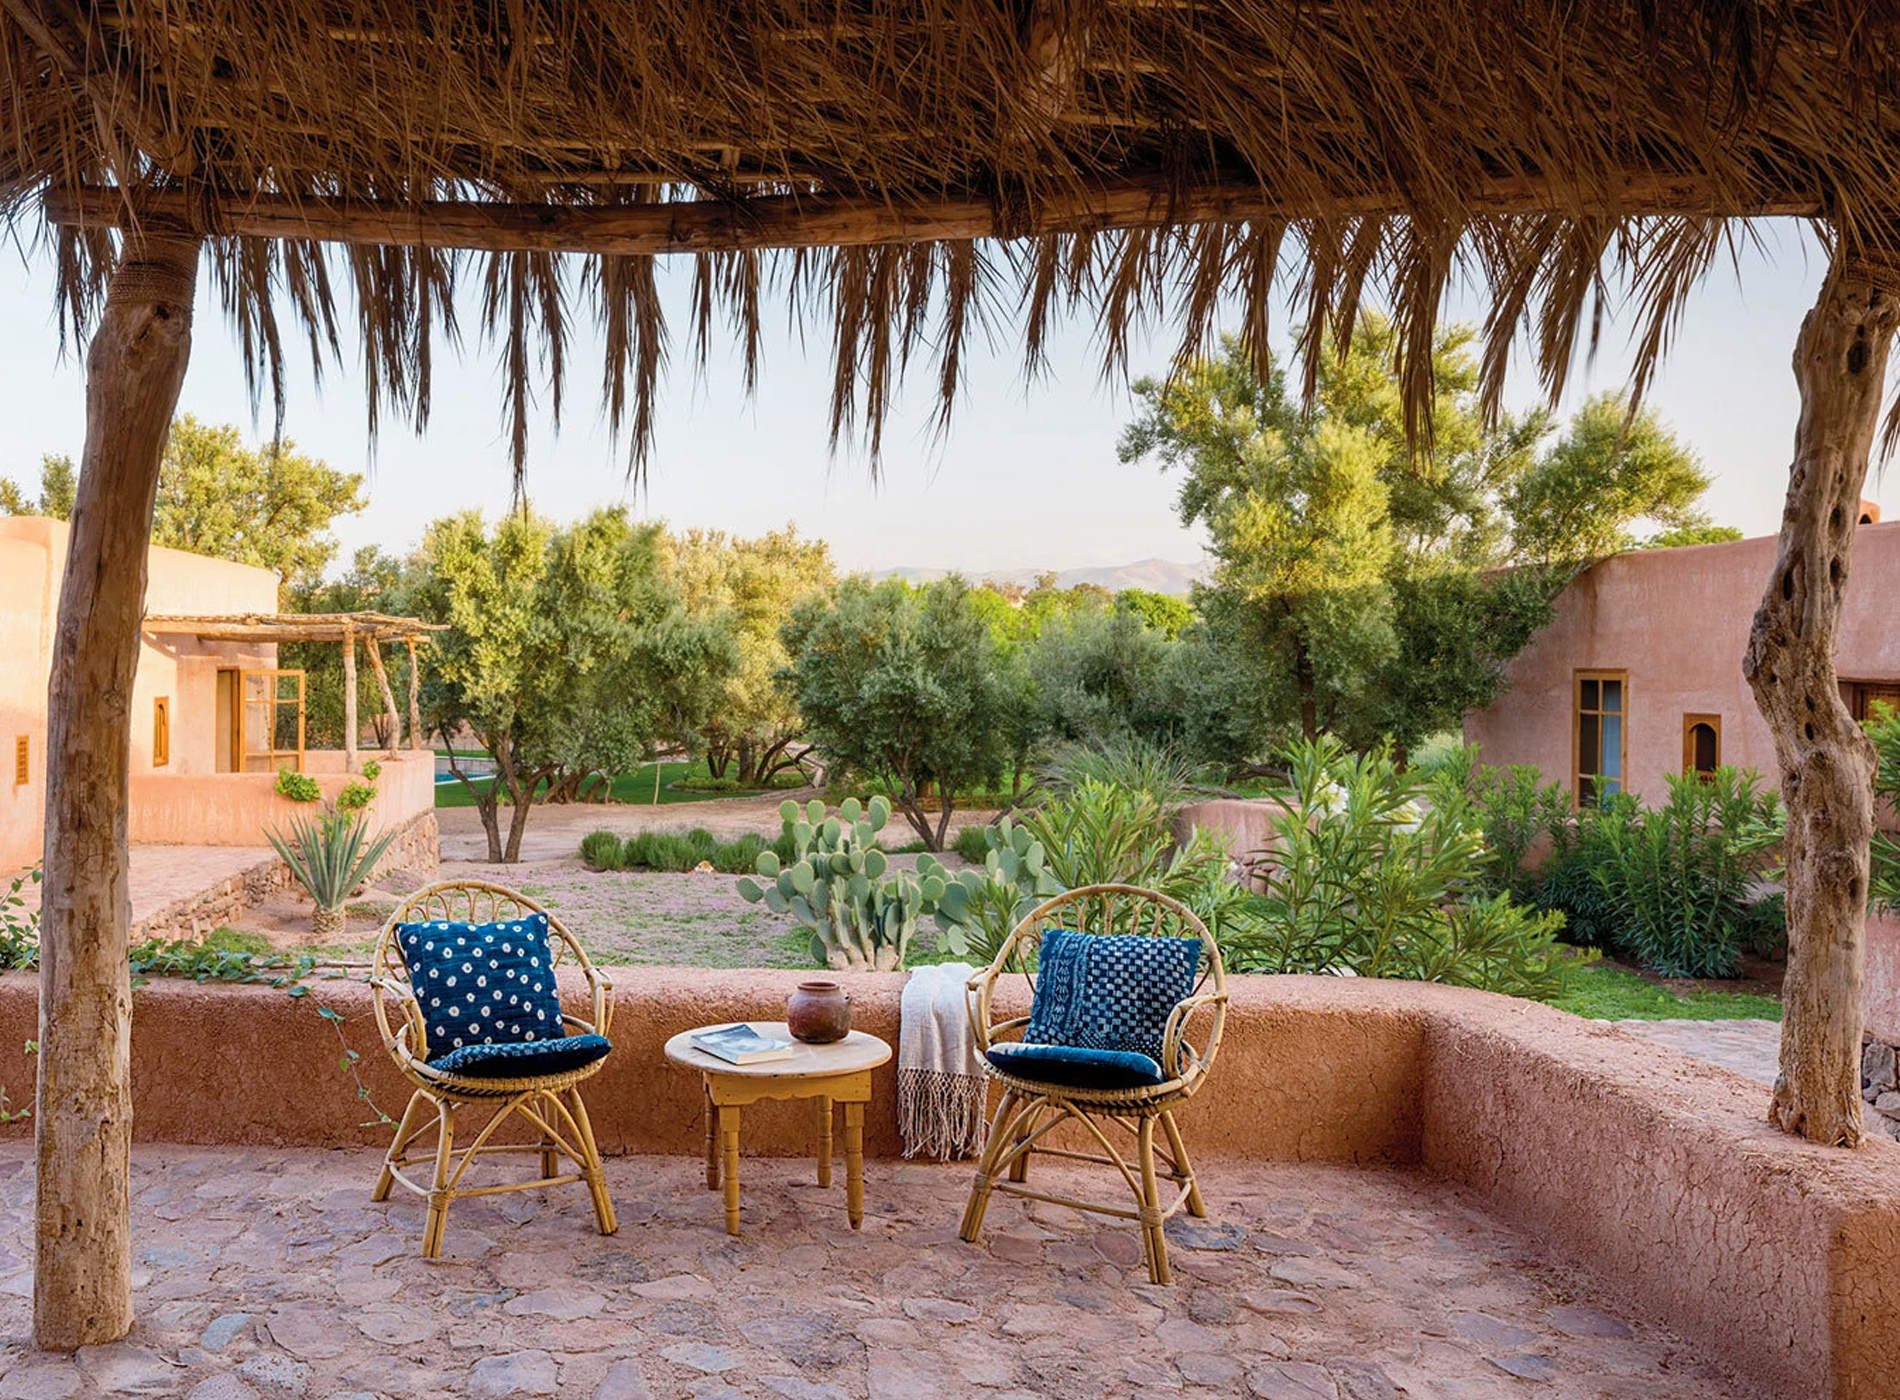 Berber Lodge Hotel Maison Oumnas Maroc Marrakech Vue Terrasse